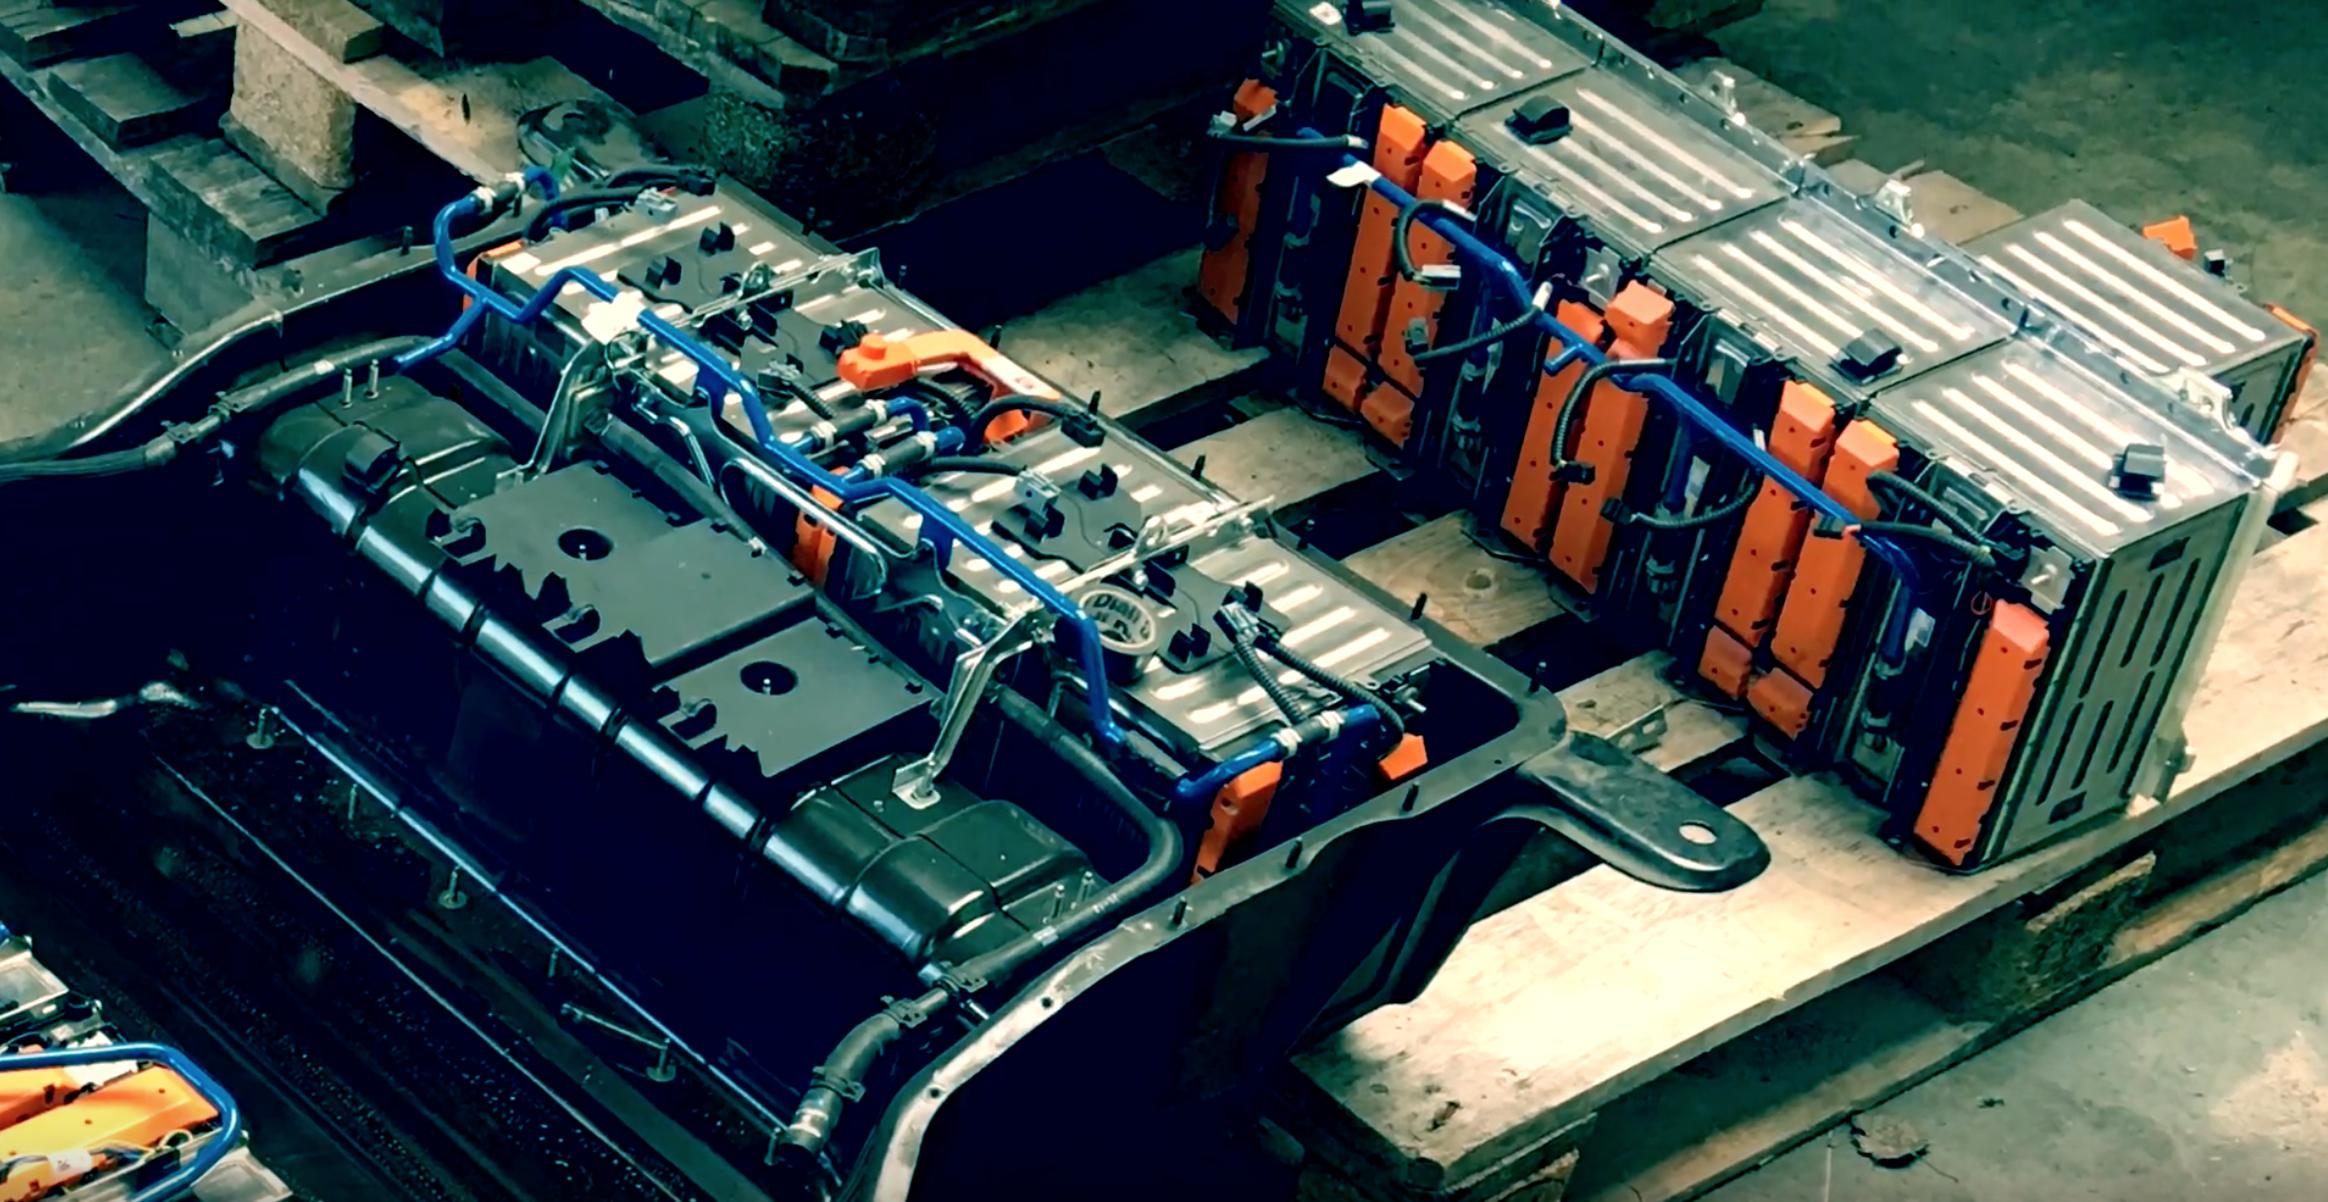 Літієва батарея - найкраща практика